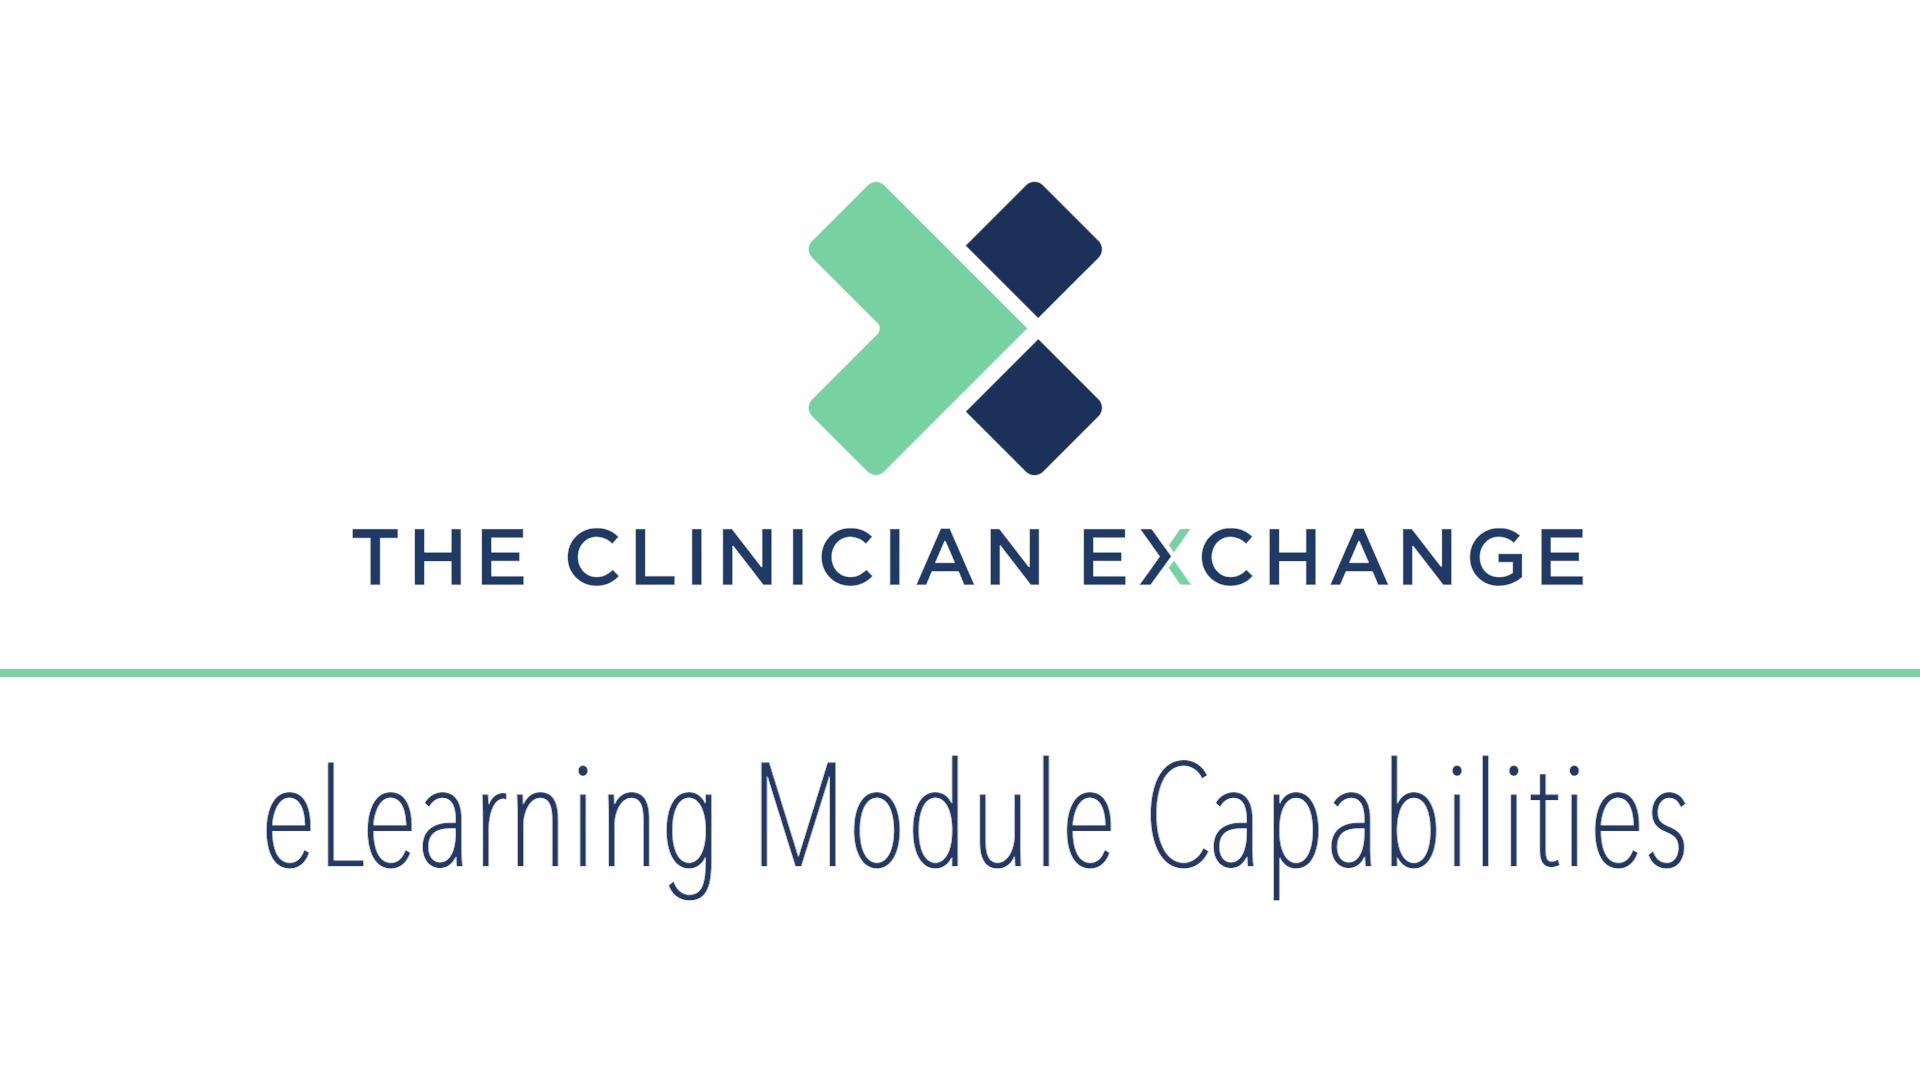 eLearning Module Capabilities